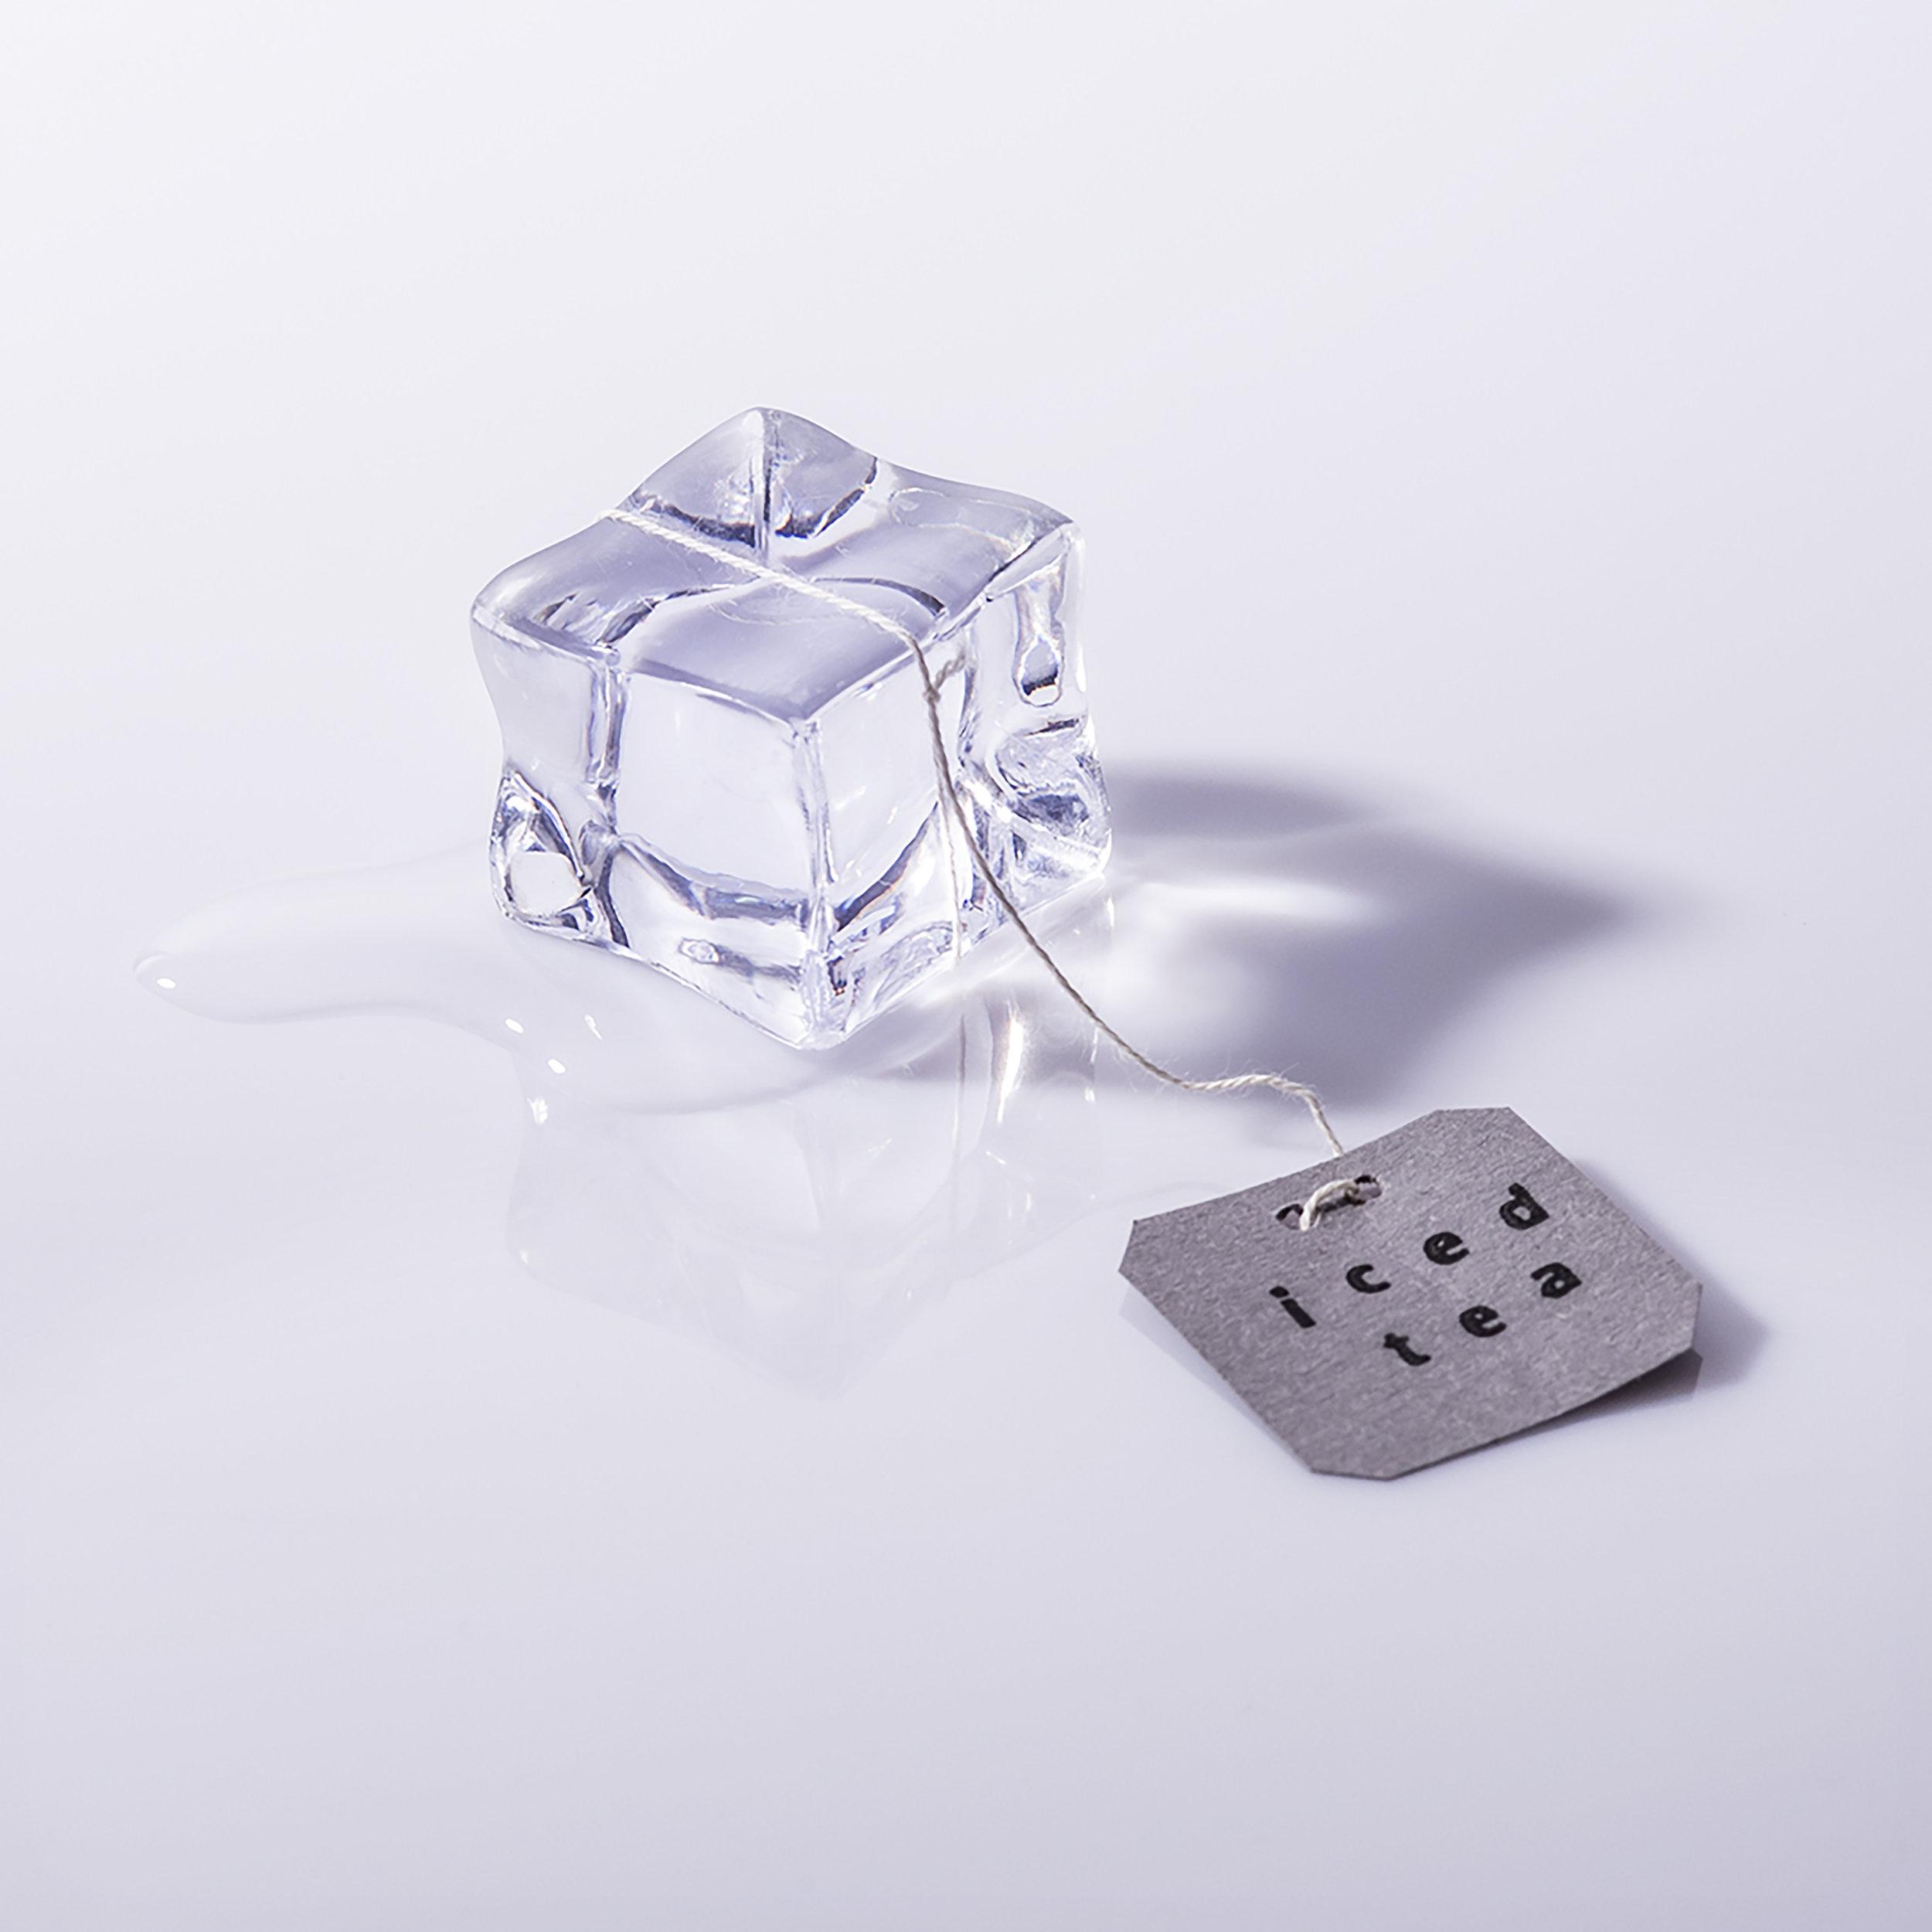 June 10th - Iced Tea Day